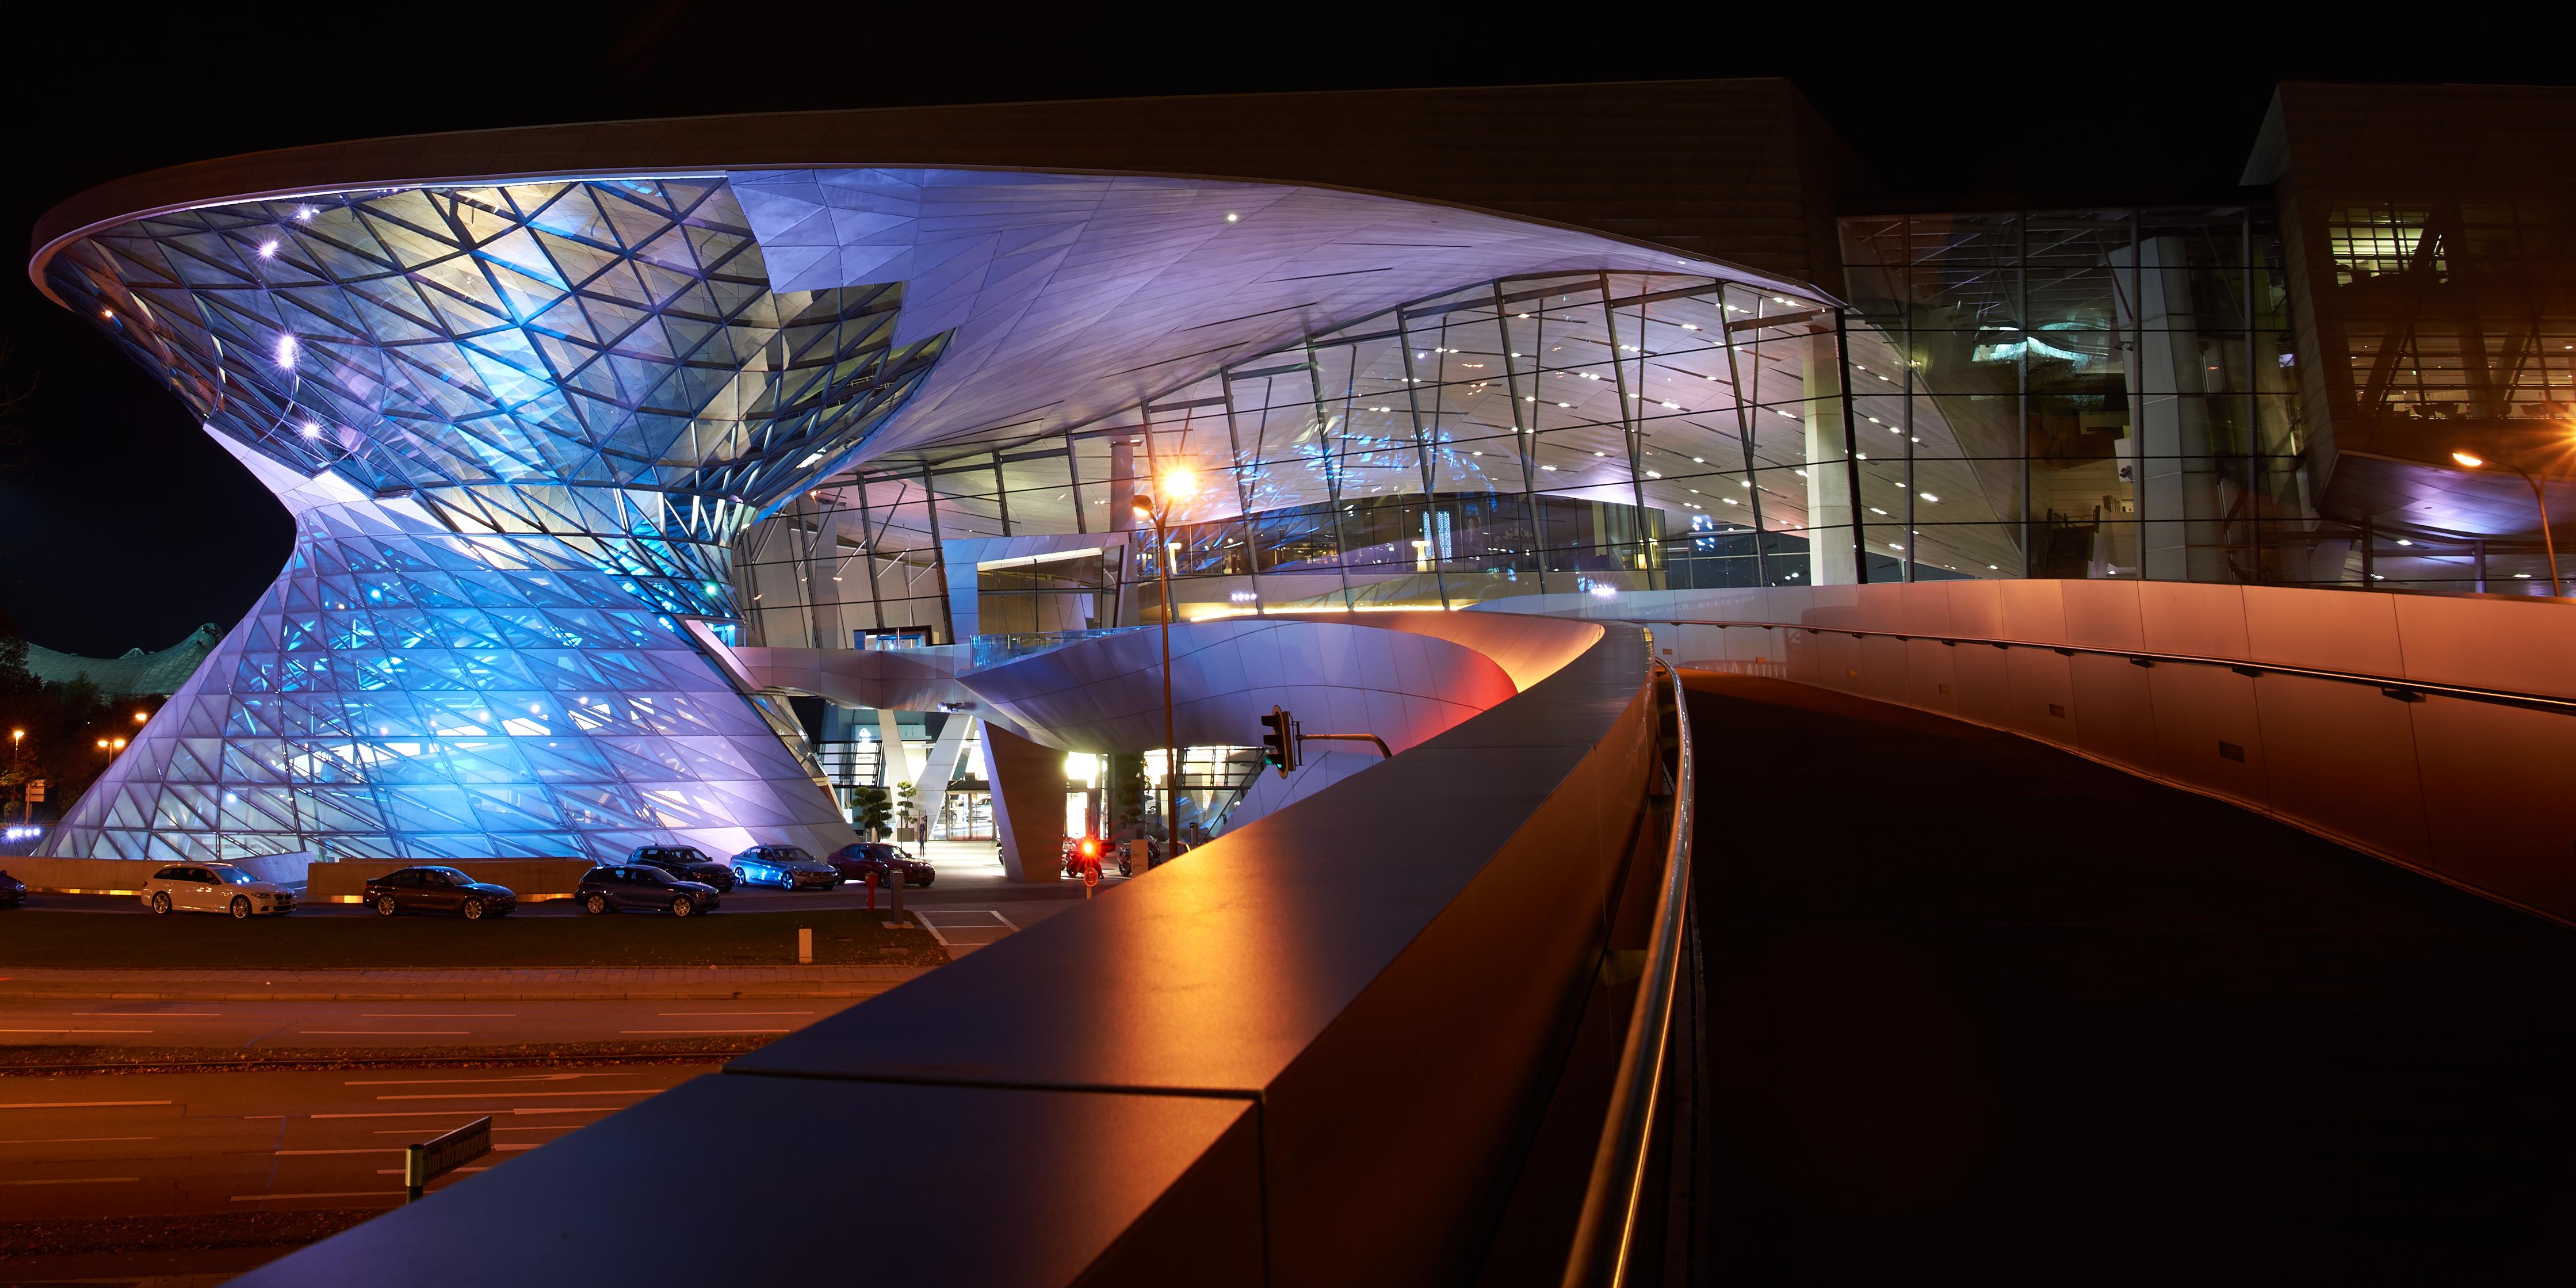 File:BMW-Welt-2012-11-04.jpg - Wikimedia Commons